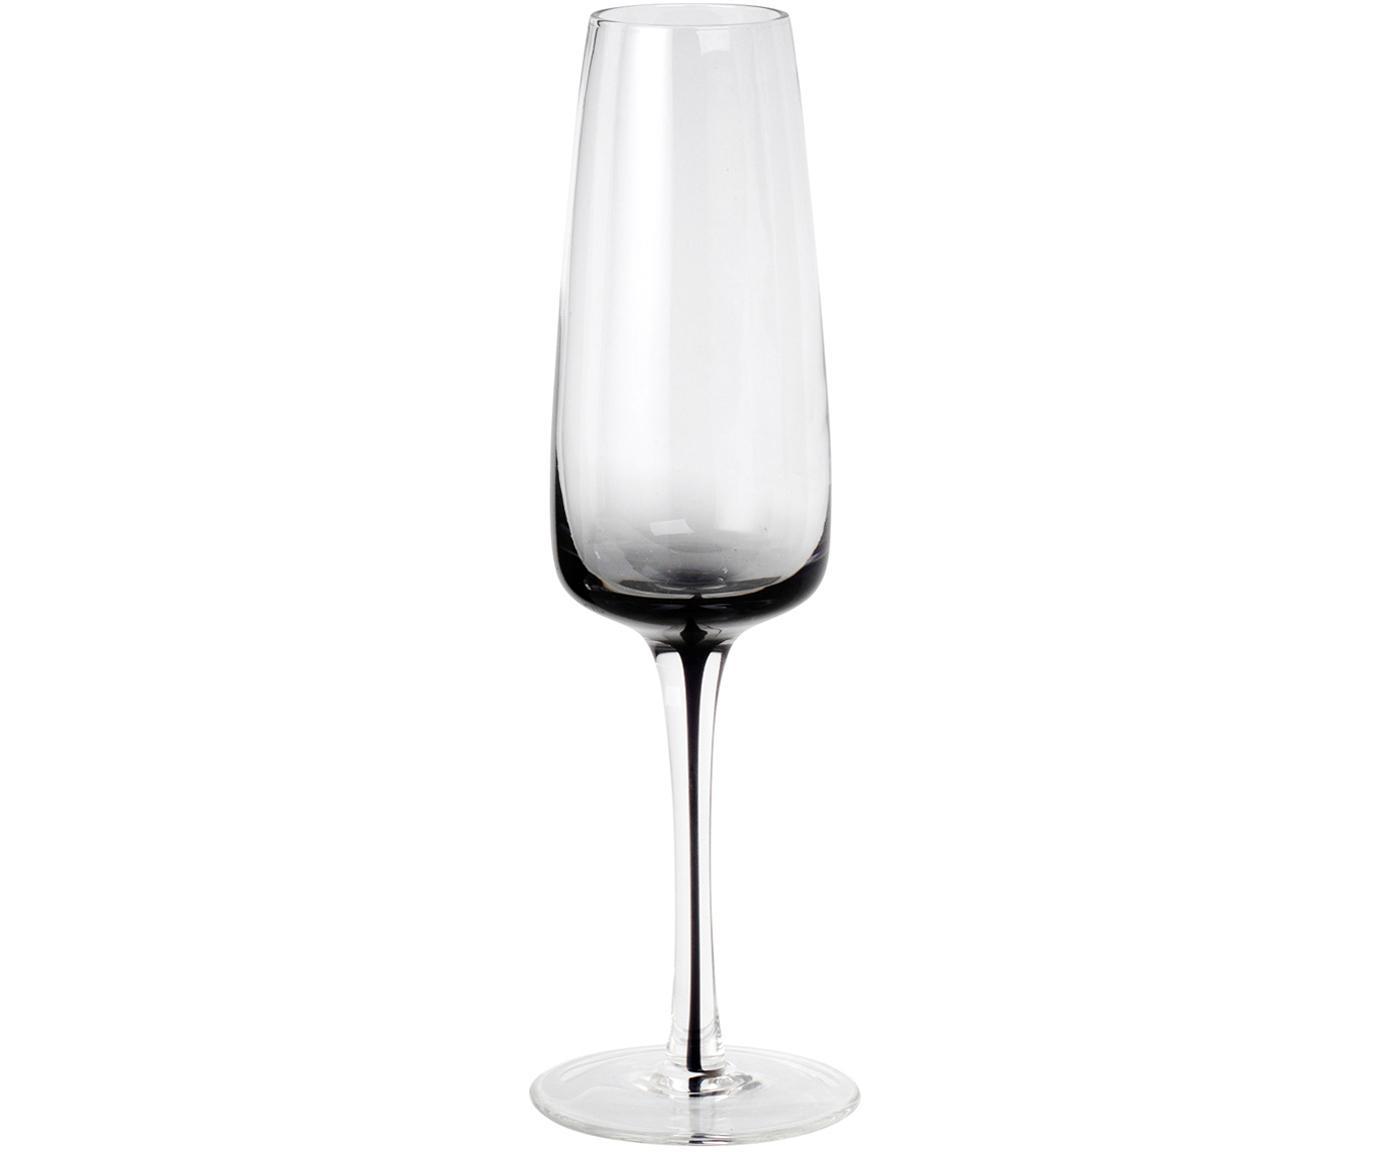 Flute champagne in vetro soffiato Smoke 4 pz, Vetro (soda-lime), gonfiabile, Trasparente con tinta grigia, Ø 7 x Alt. 23 cm